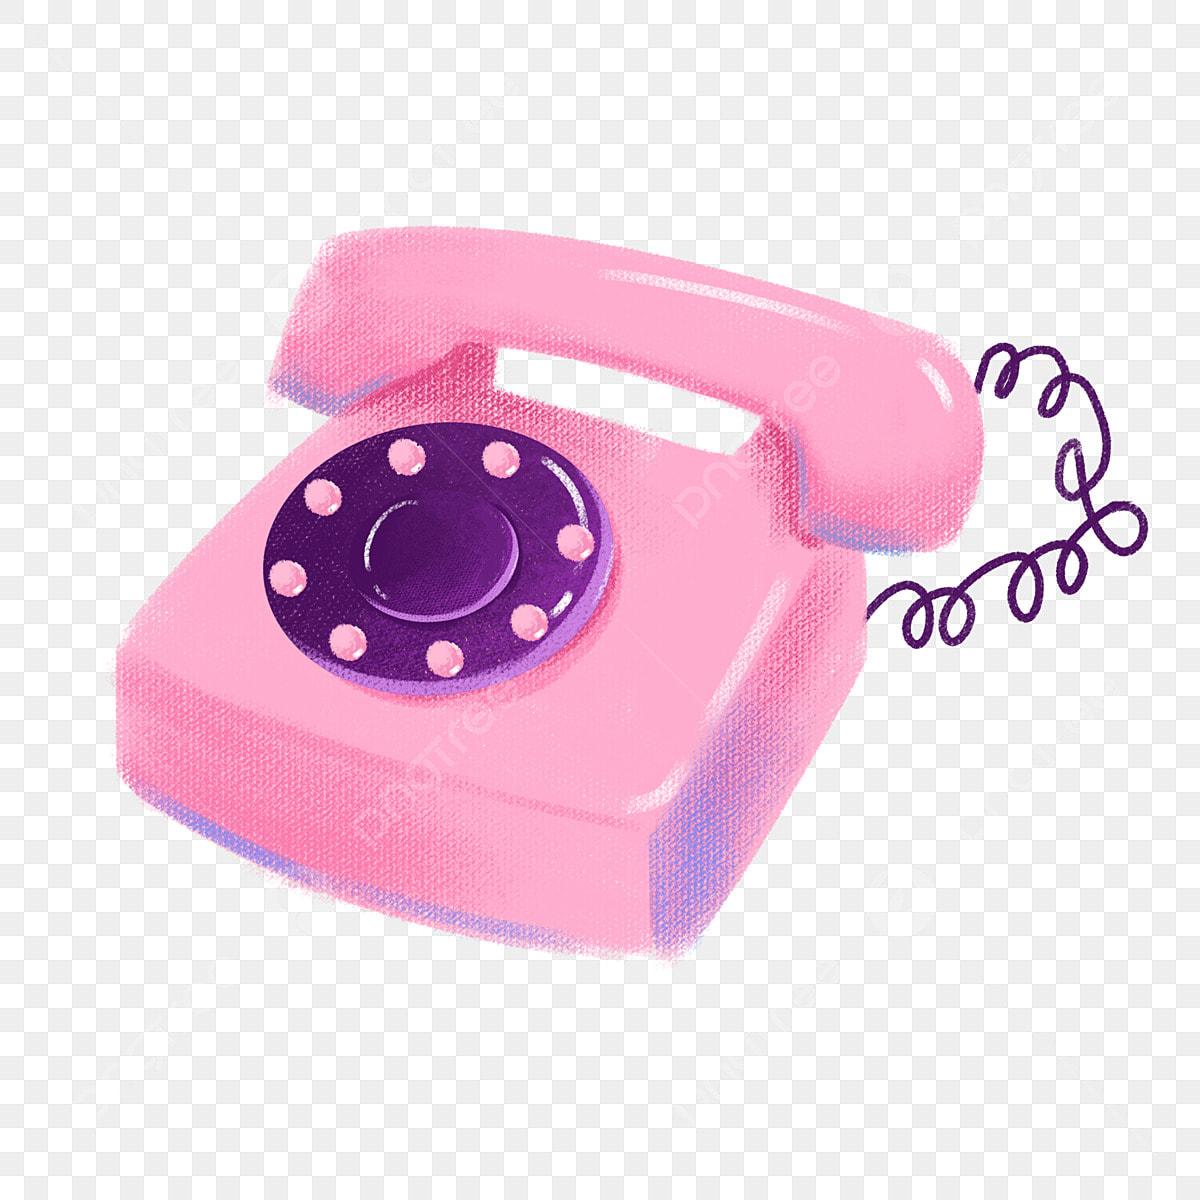 Contact Phone - Transparent Pink Phone Png, Png Download , Transparent Png  Image - PNGitem